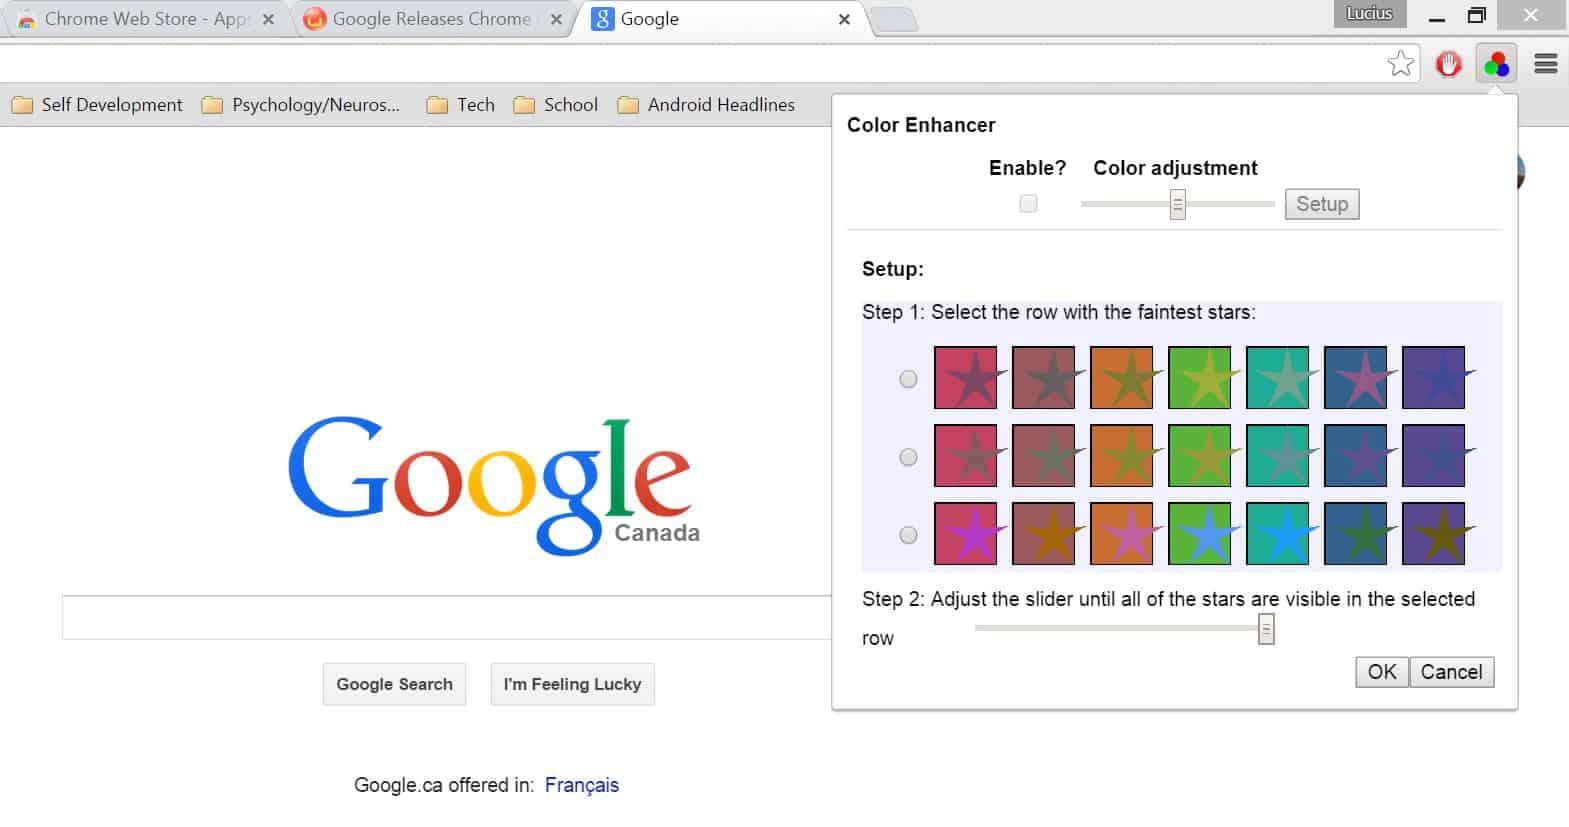 Google Color Enhancer